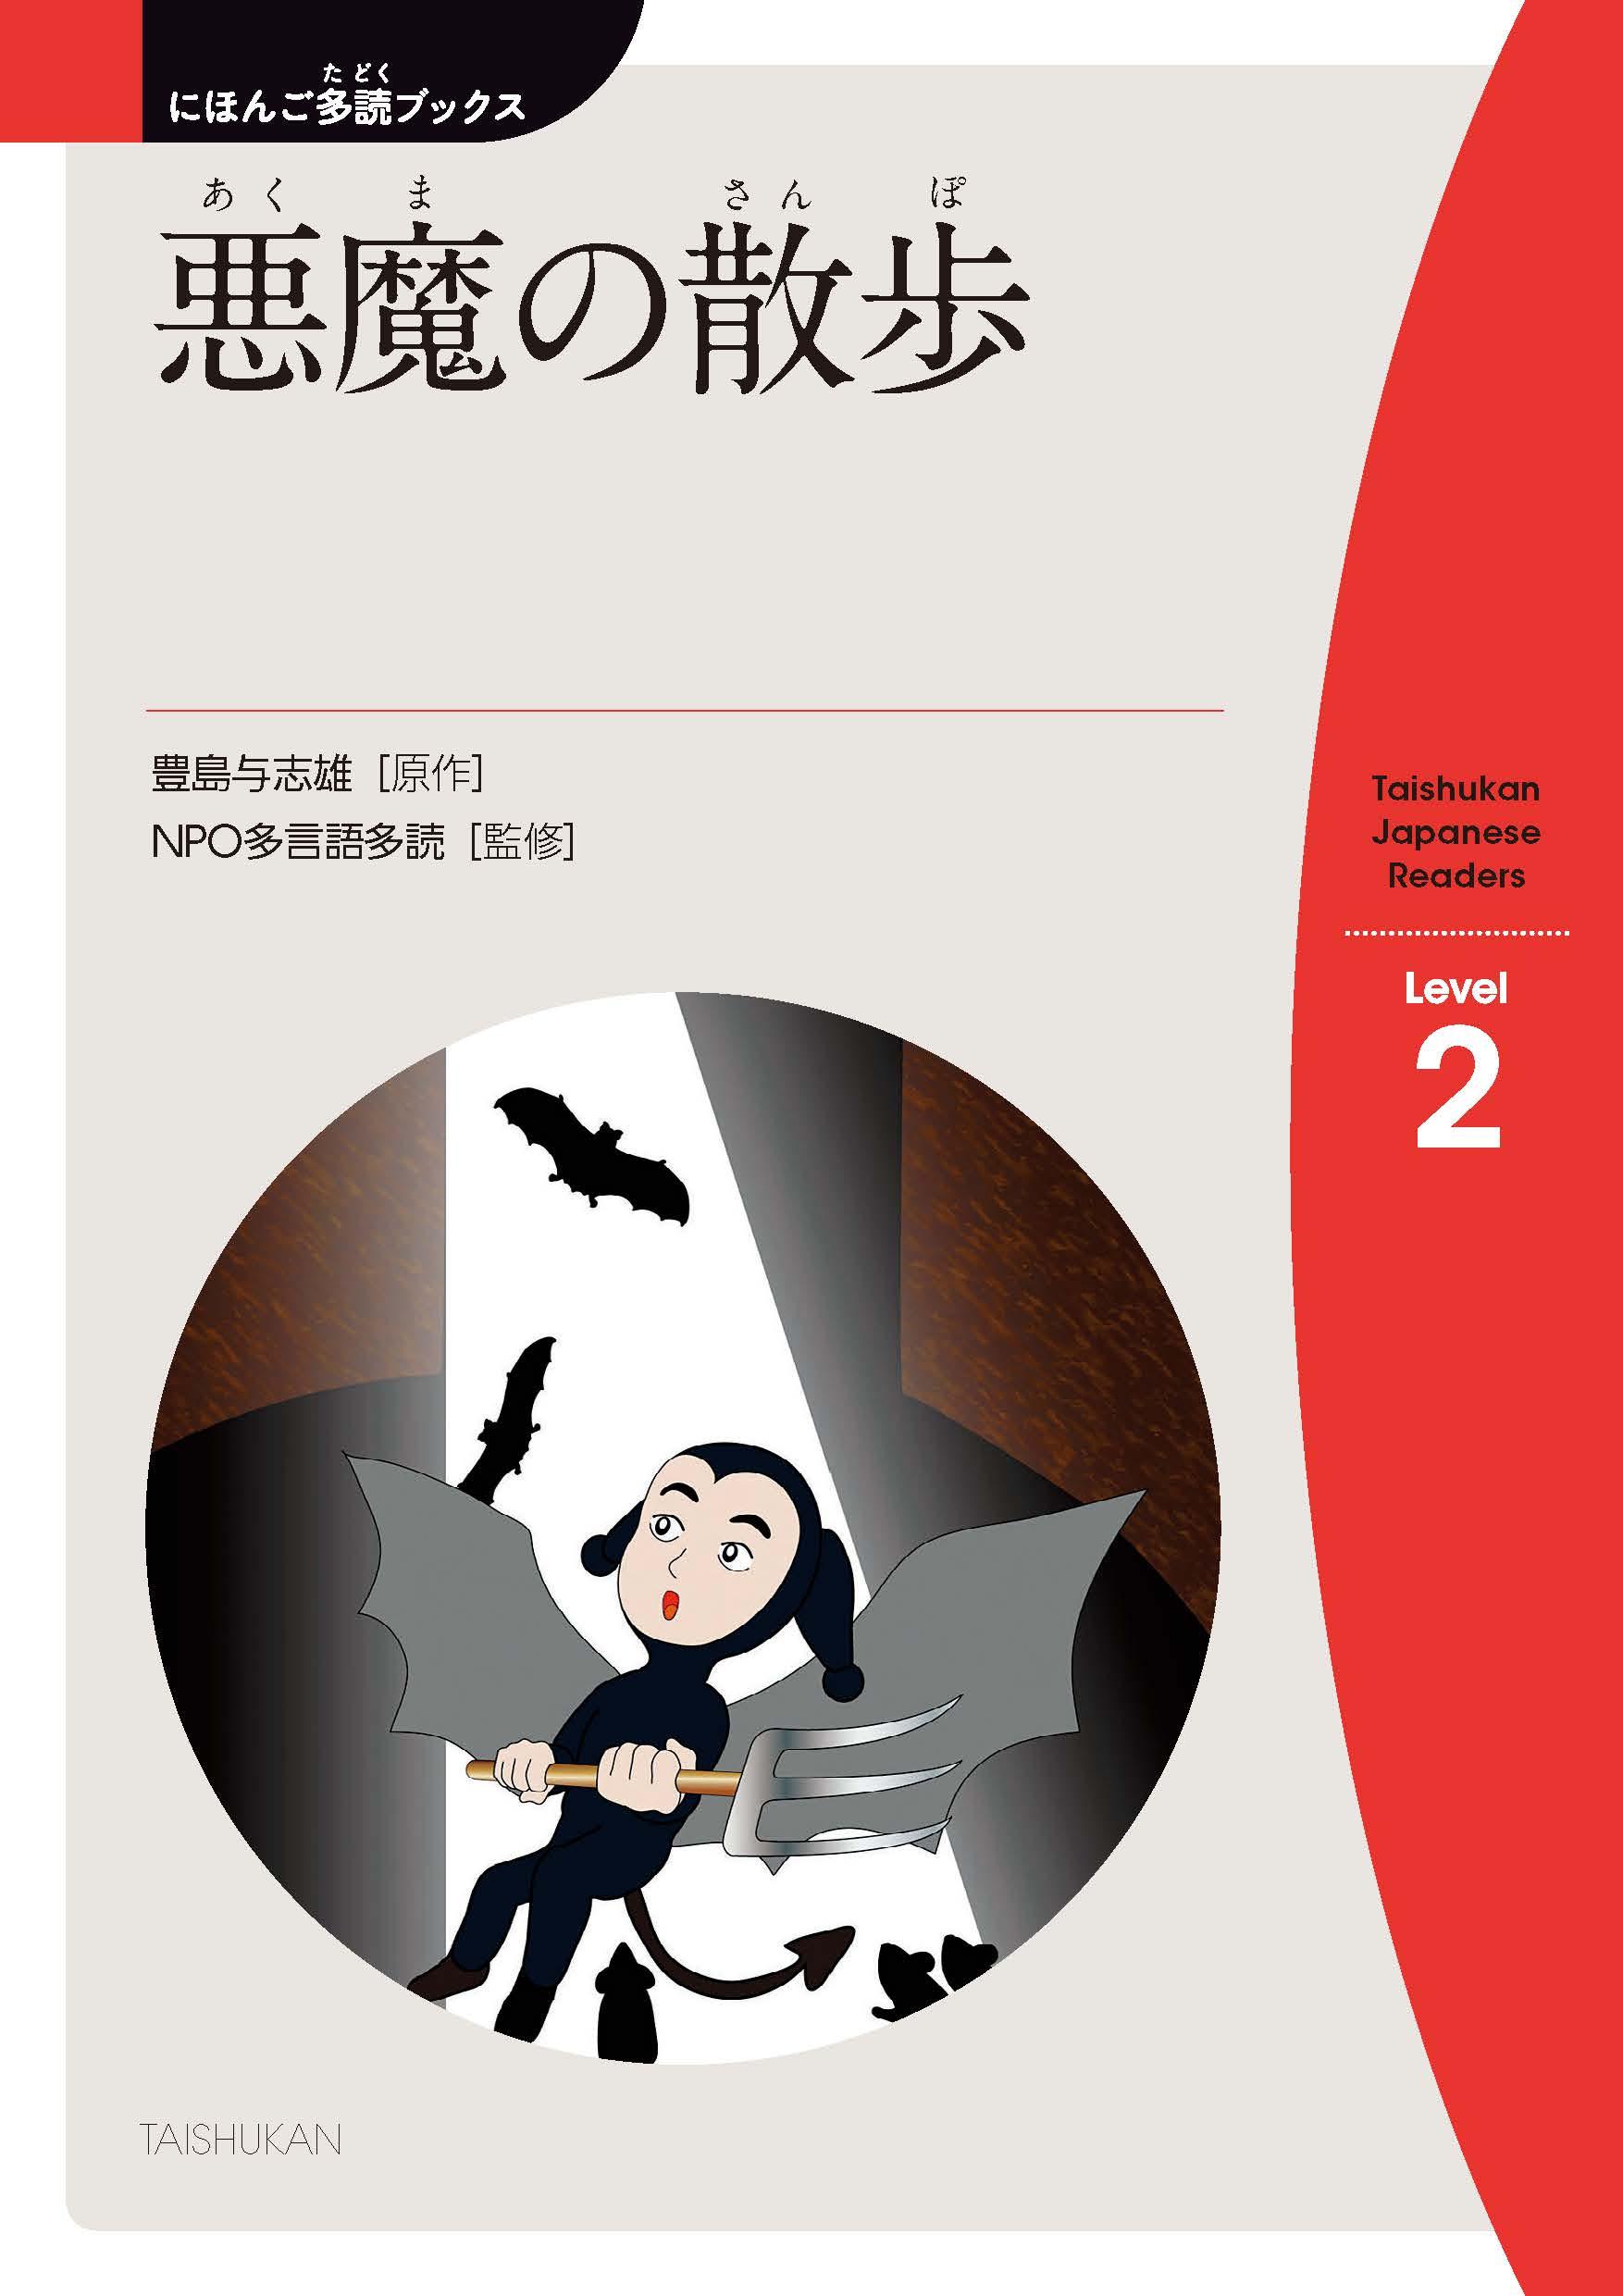 vol.2-1 悪魔(あくま)の散歩(さんぽ) The Devil's Walk